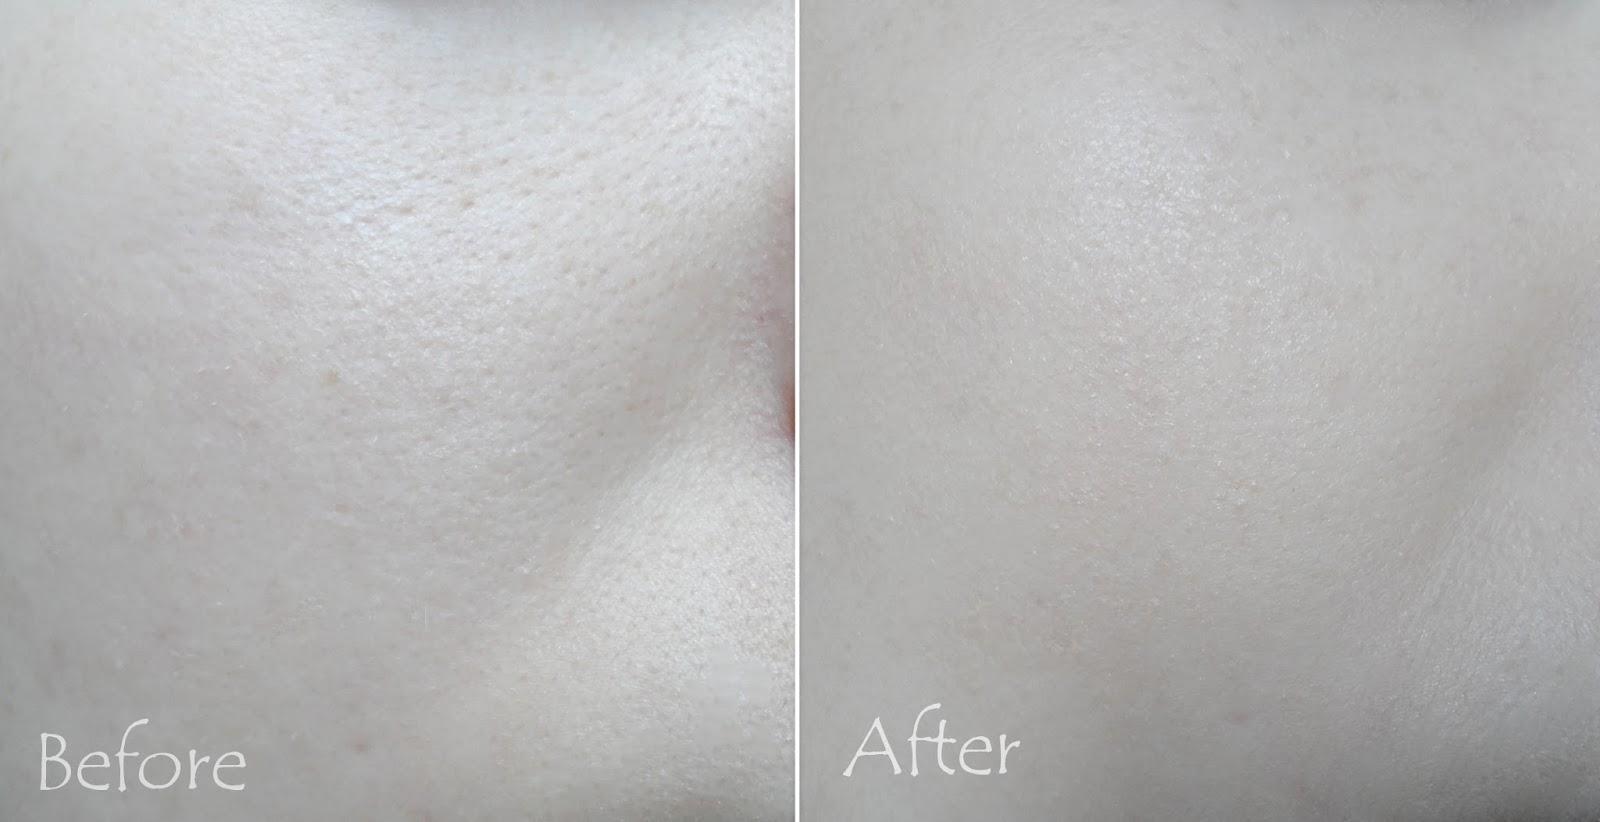 bb cream holika holika review blogger swatches liz breygel january girl korean makeup w2beauty store